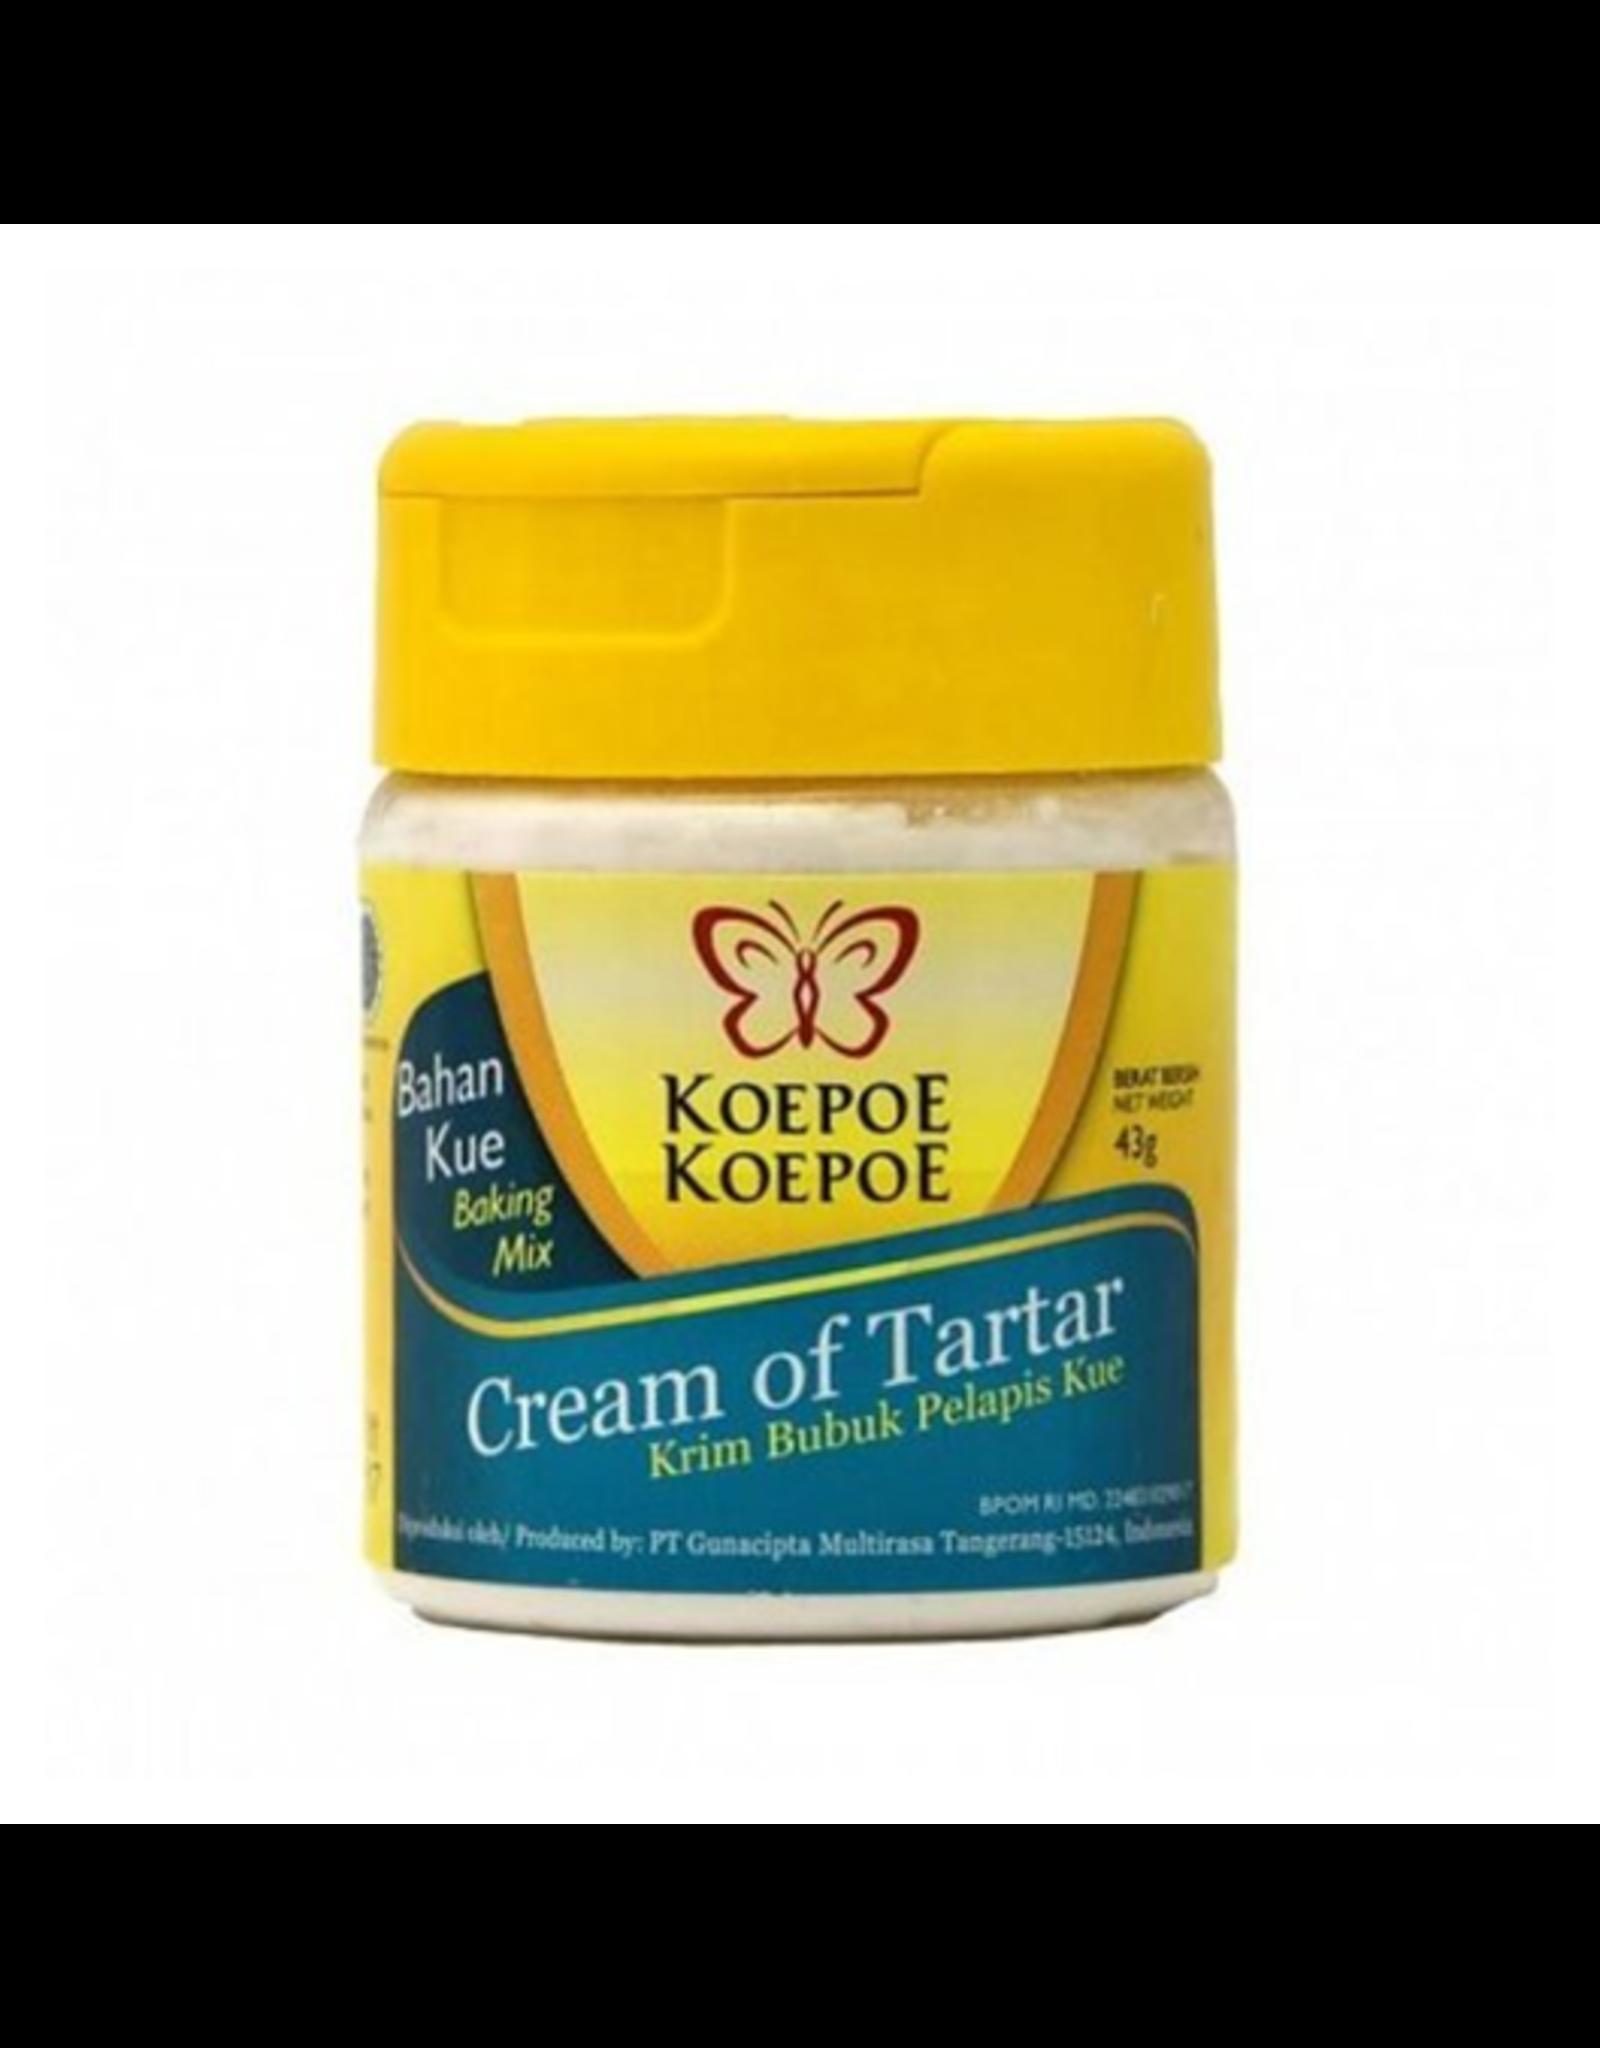 Koepoe Koepoe Cream of Tartar